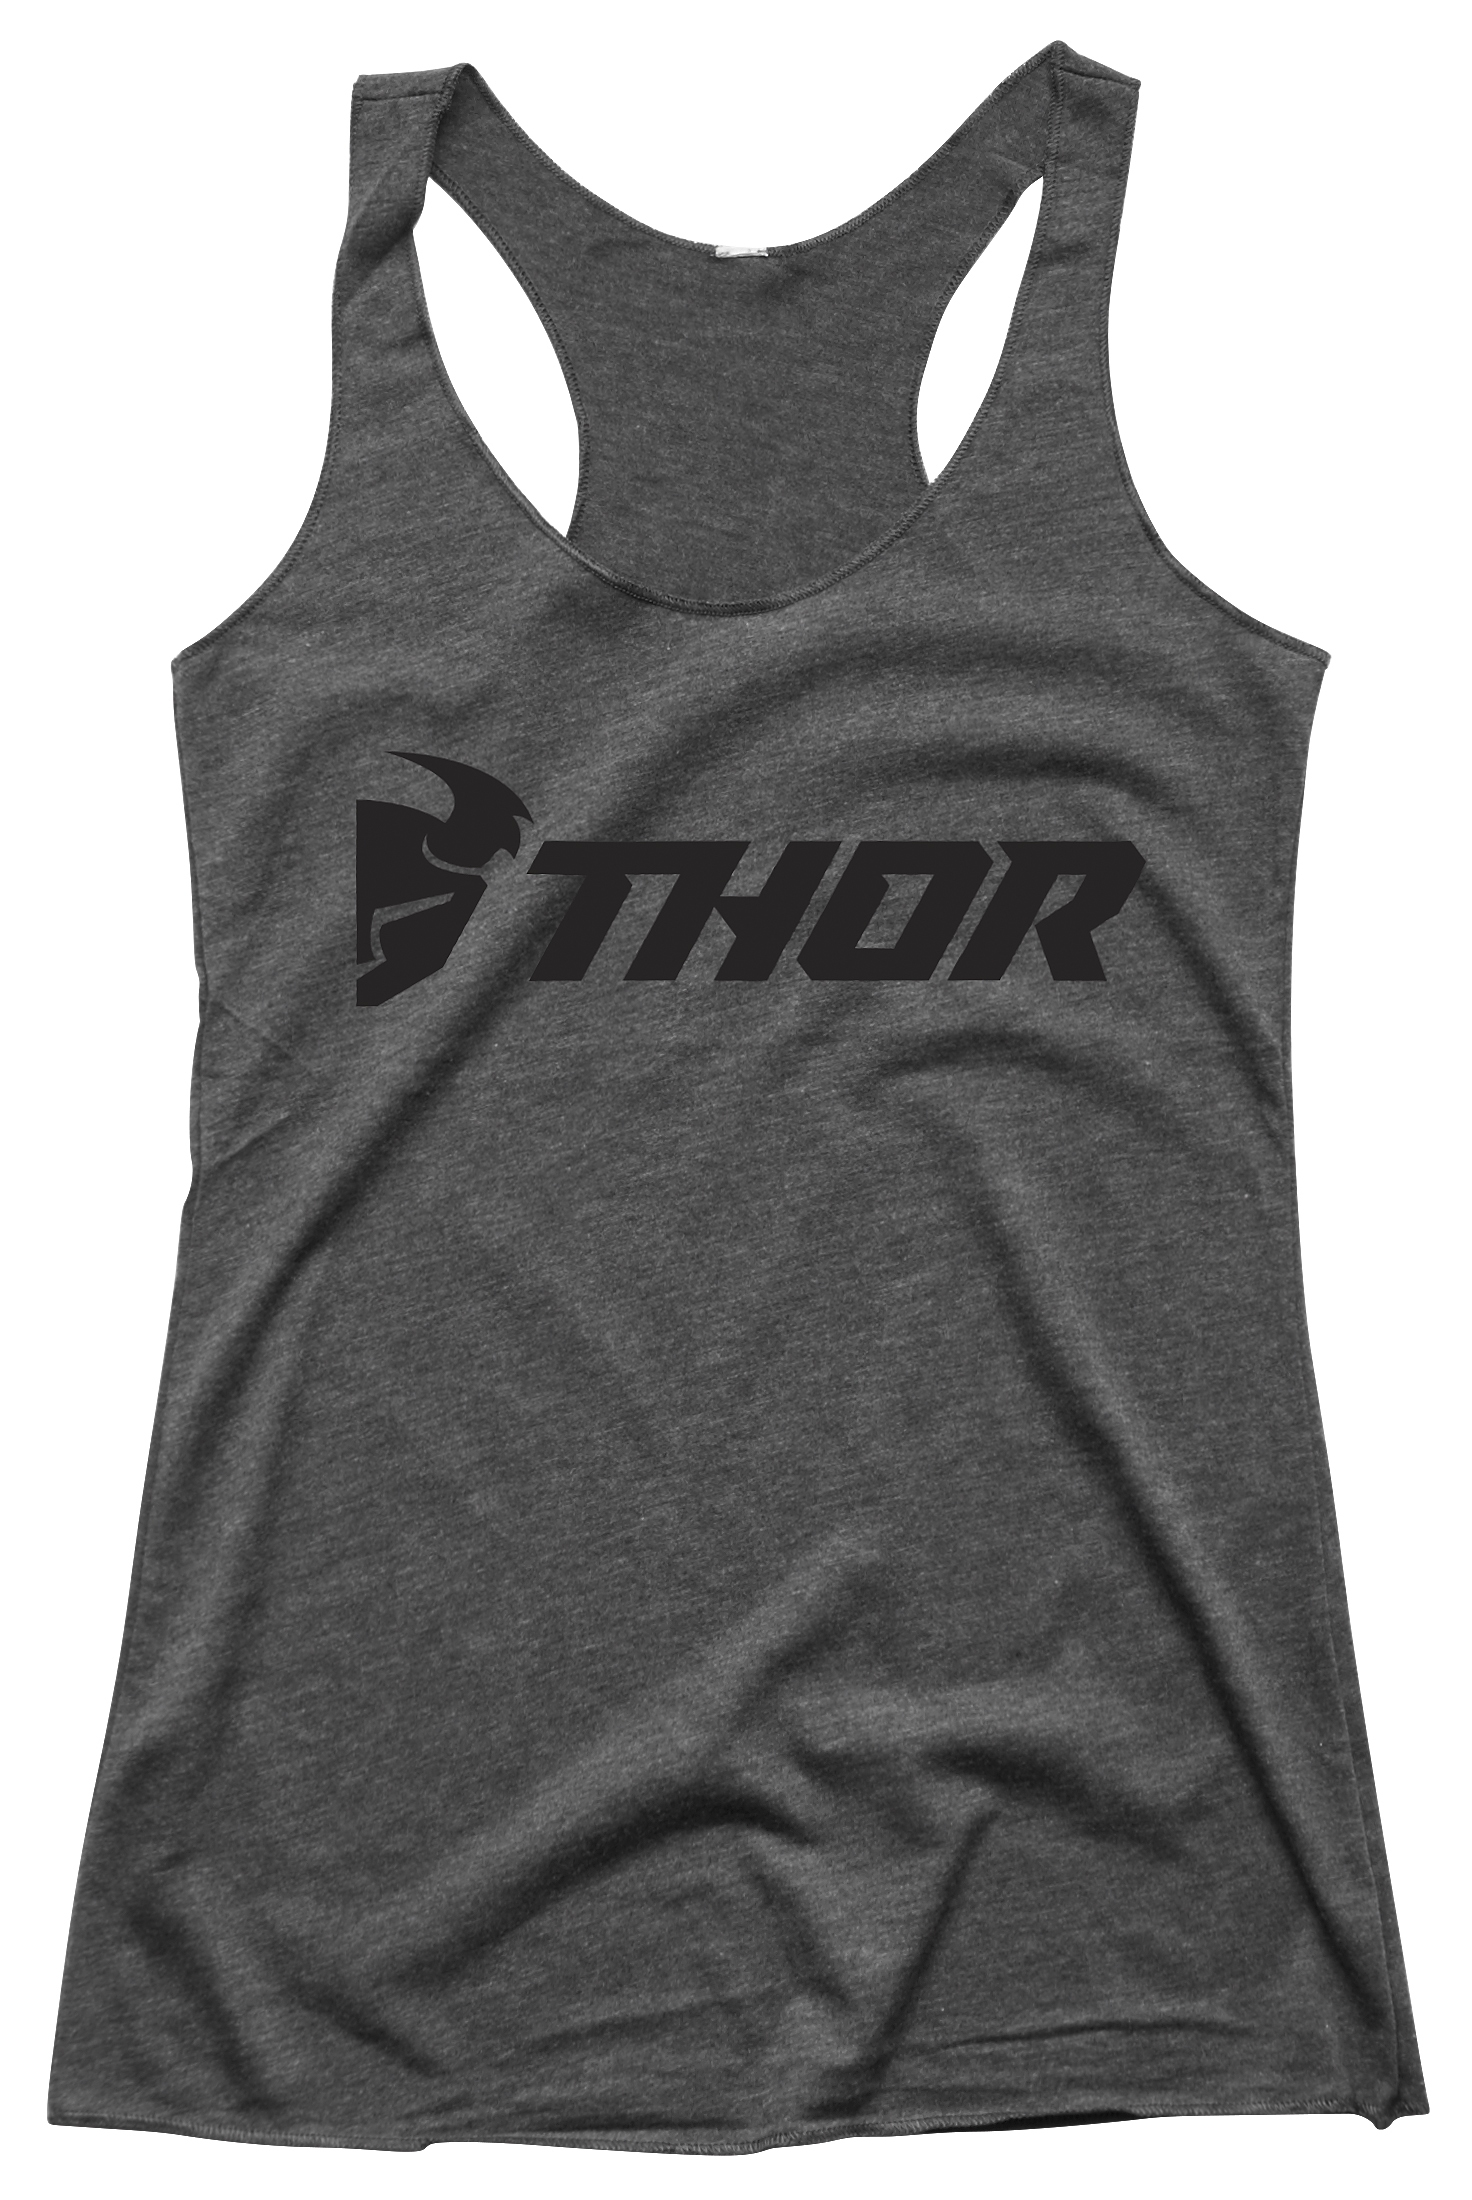 e8c121b89ac0a Thor Loud Women s Tank Top - RevZilla